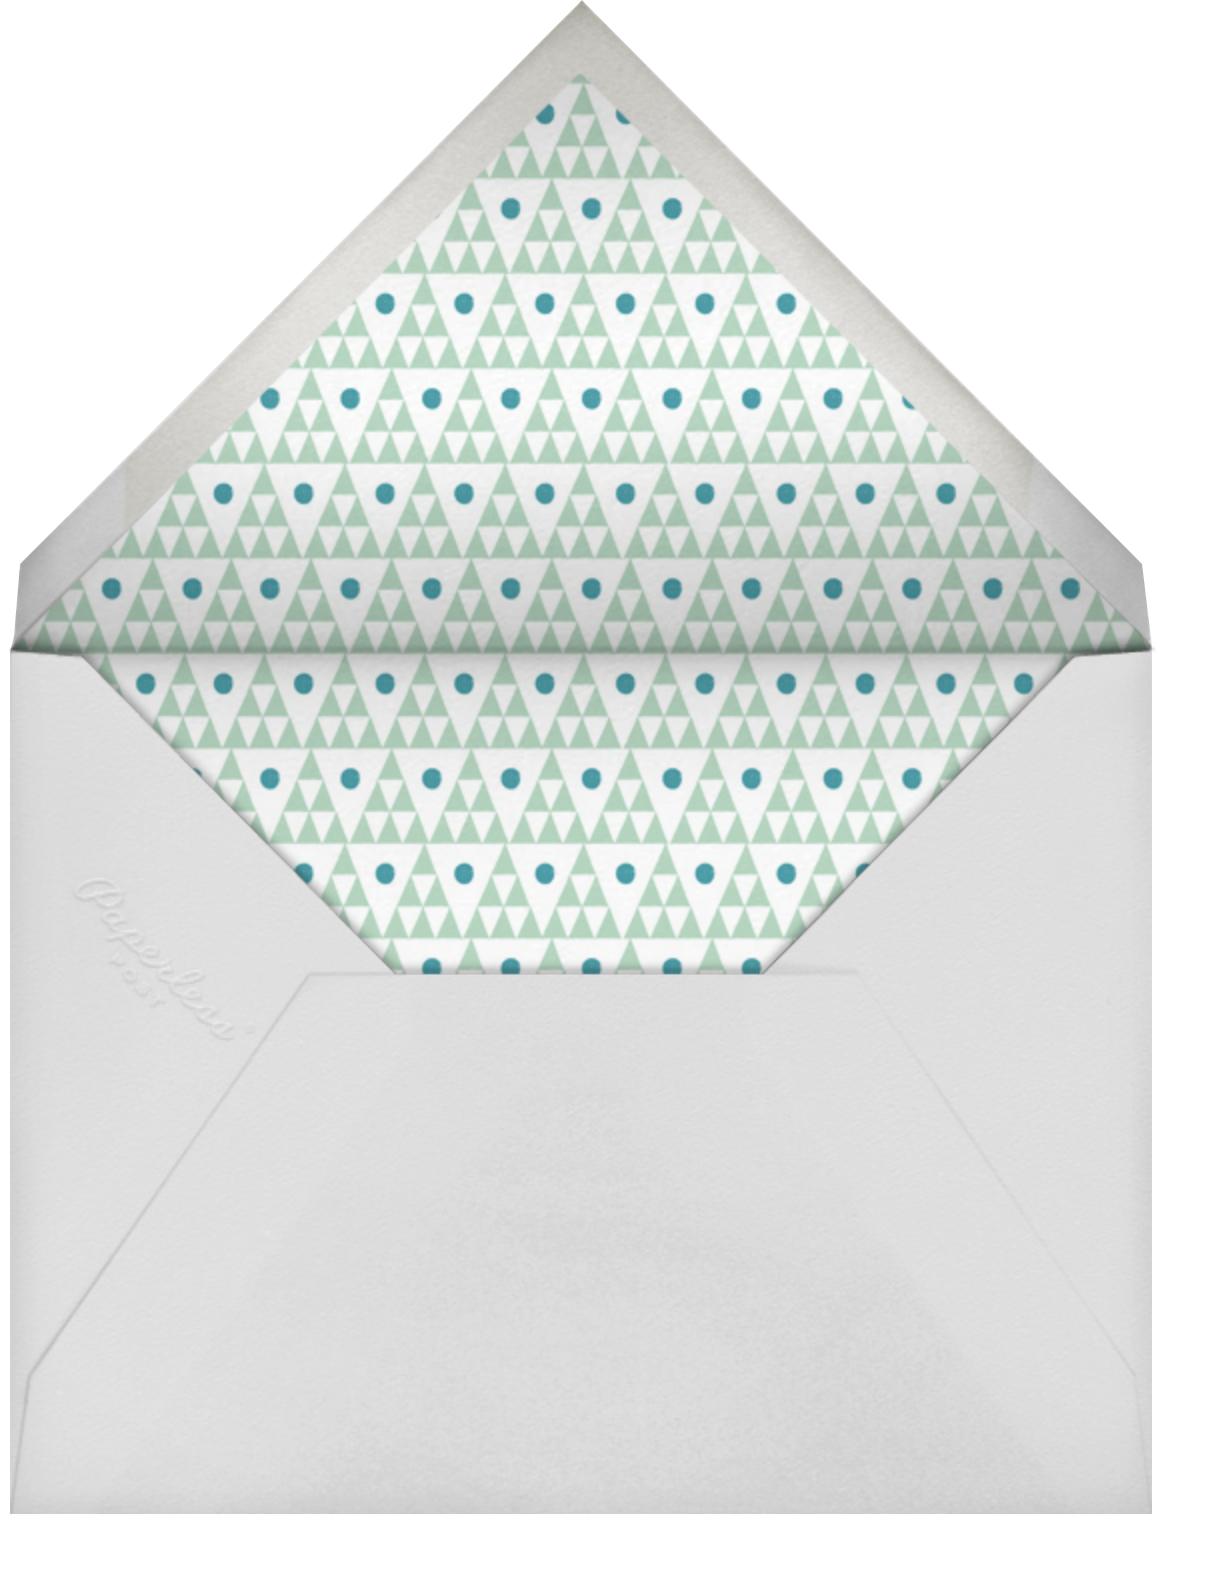 Five Seconds - Deep - Mr. Boddington's Studio - Envelope